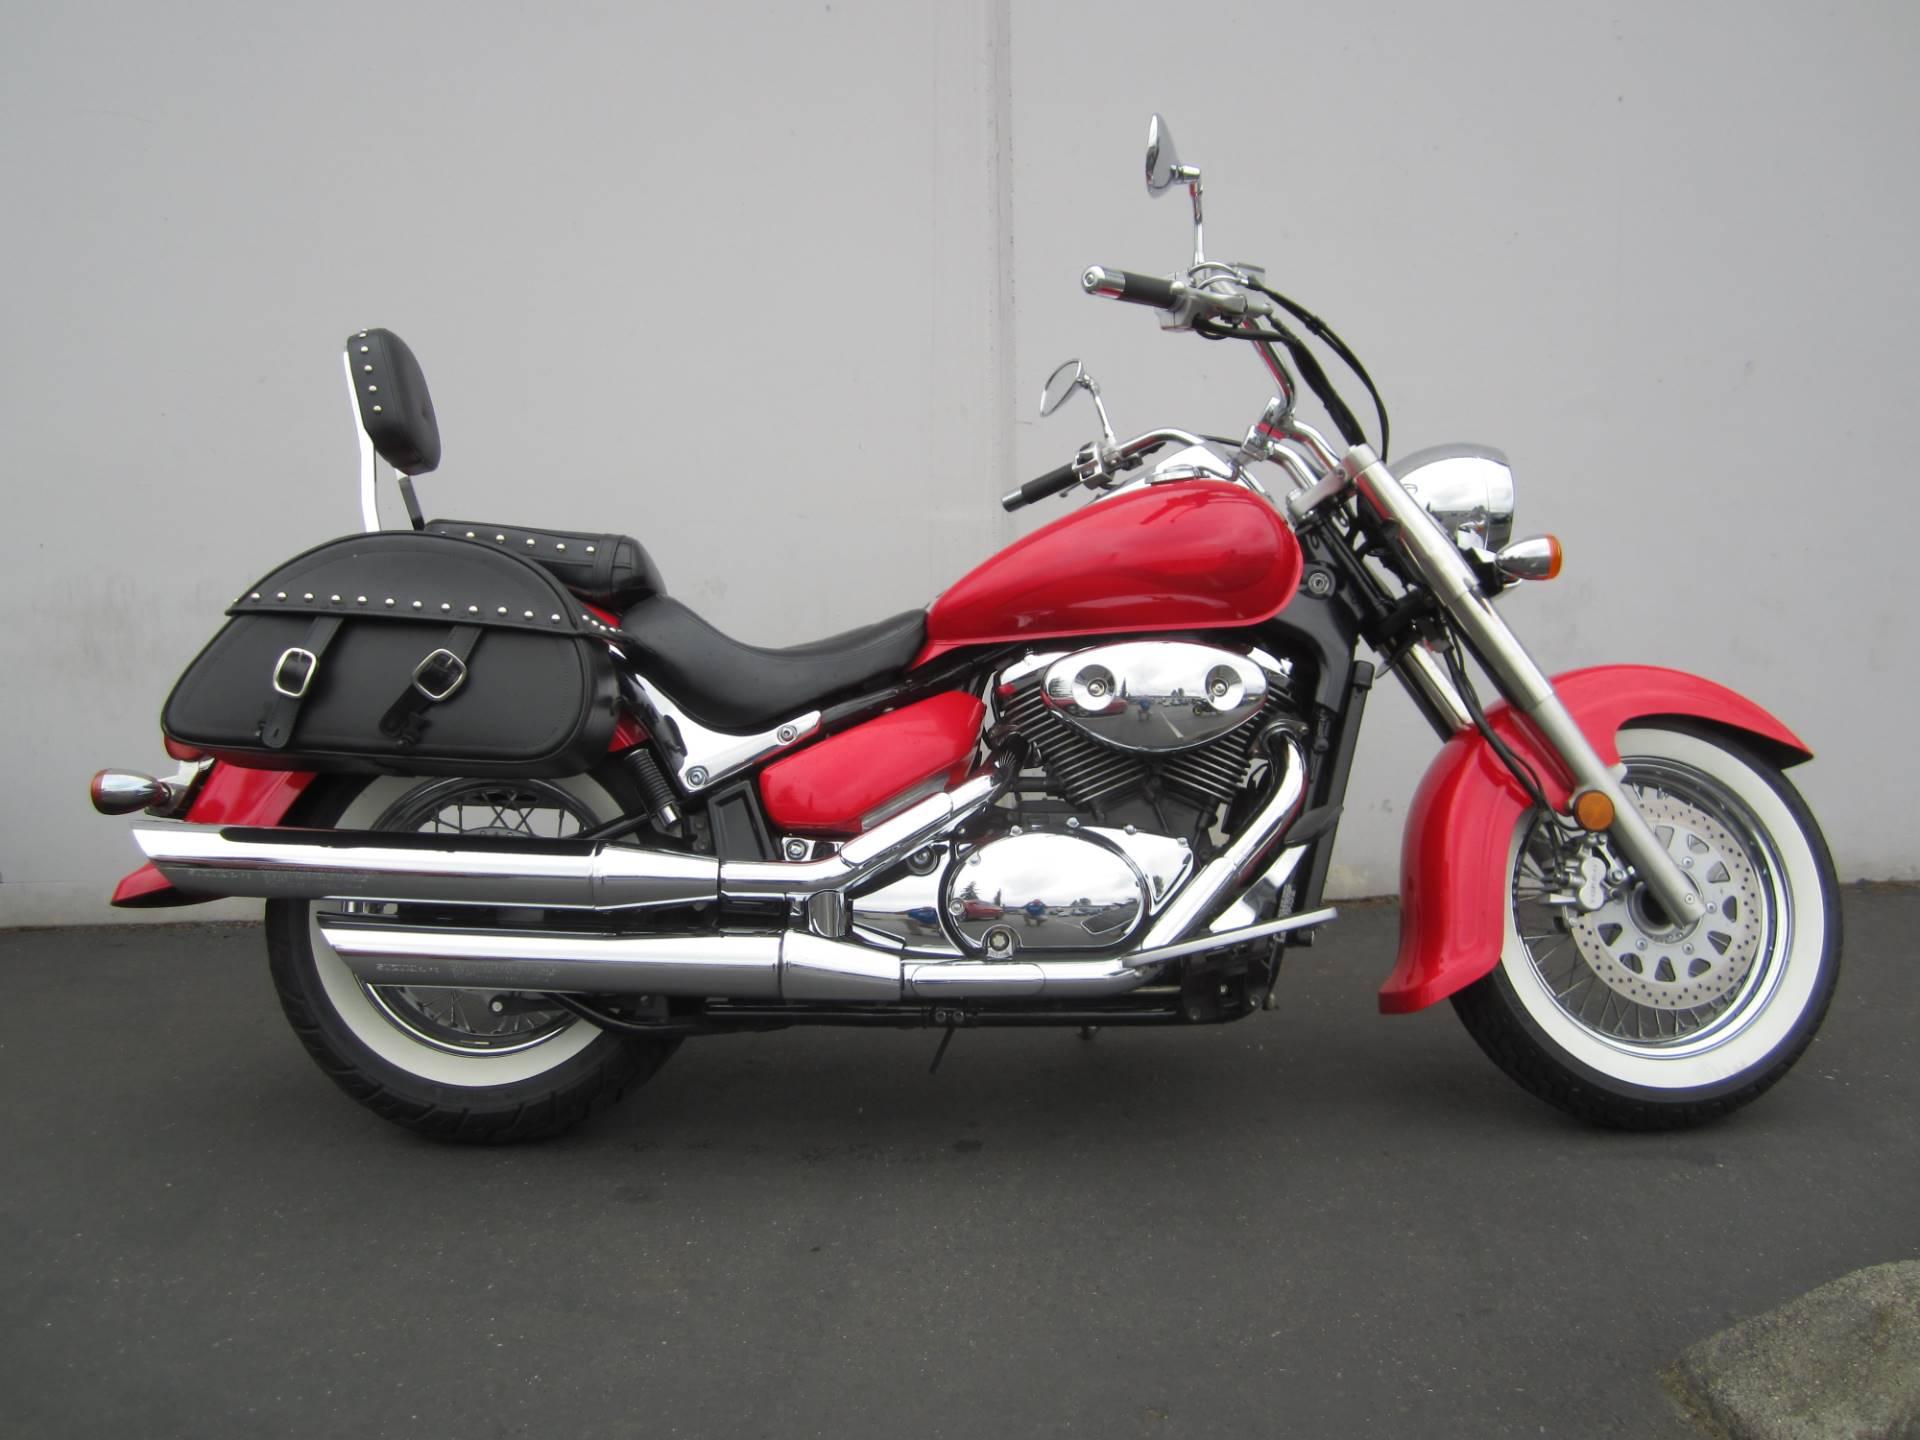 used 2005 suzuki boulevard c50 limited motorcycles in monroe wa. Black Bedroom Furniture Sets. Home Design Ideas